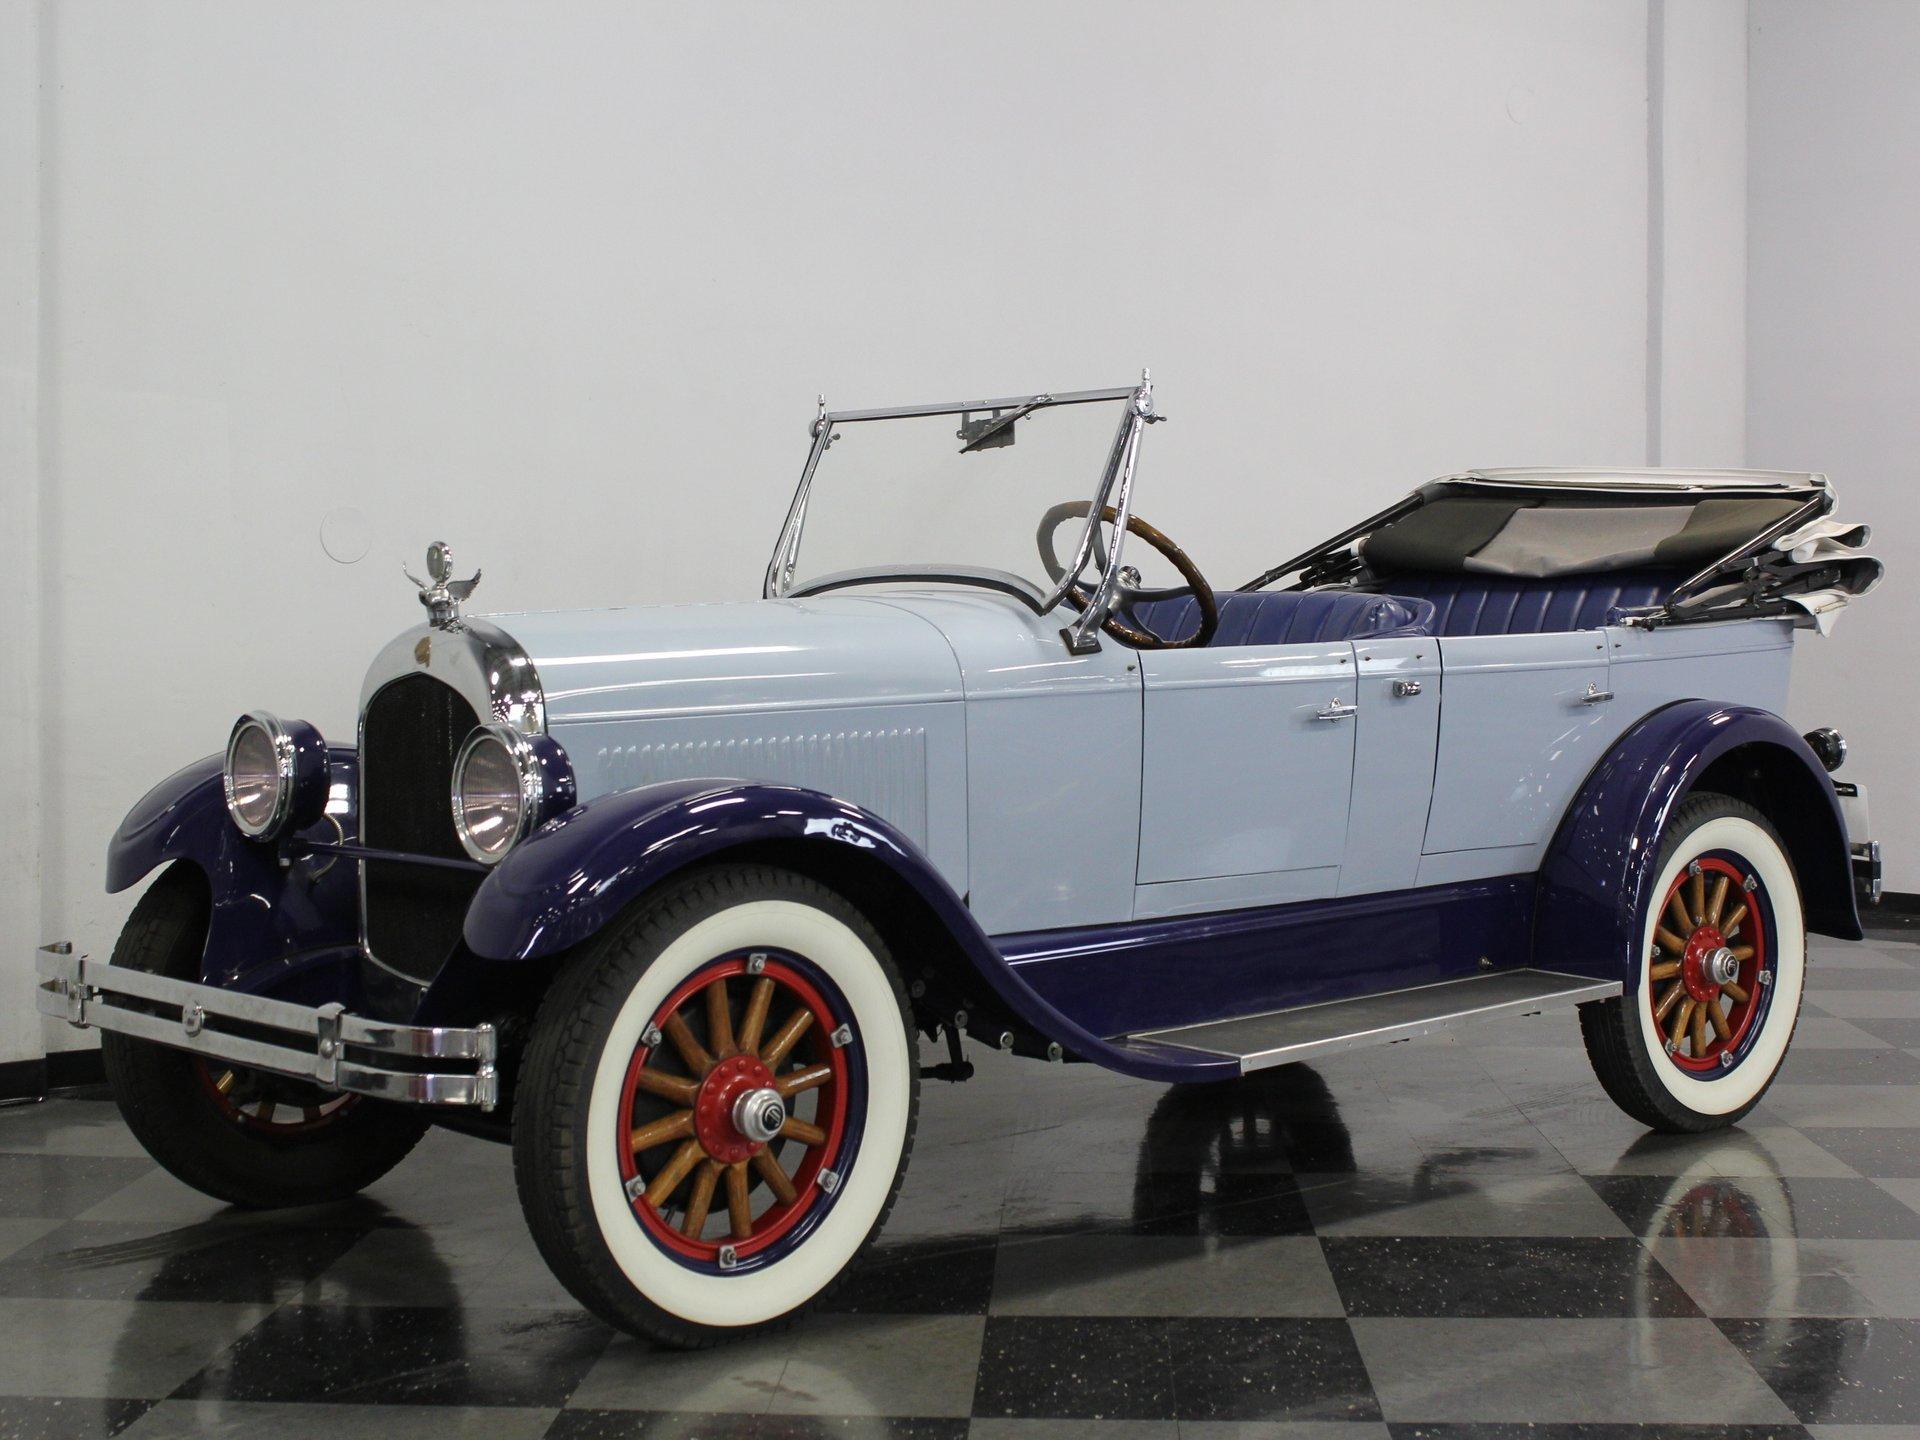 1925 chrysler b70 phaeton